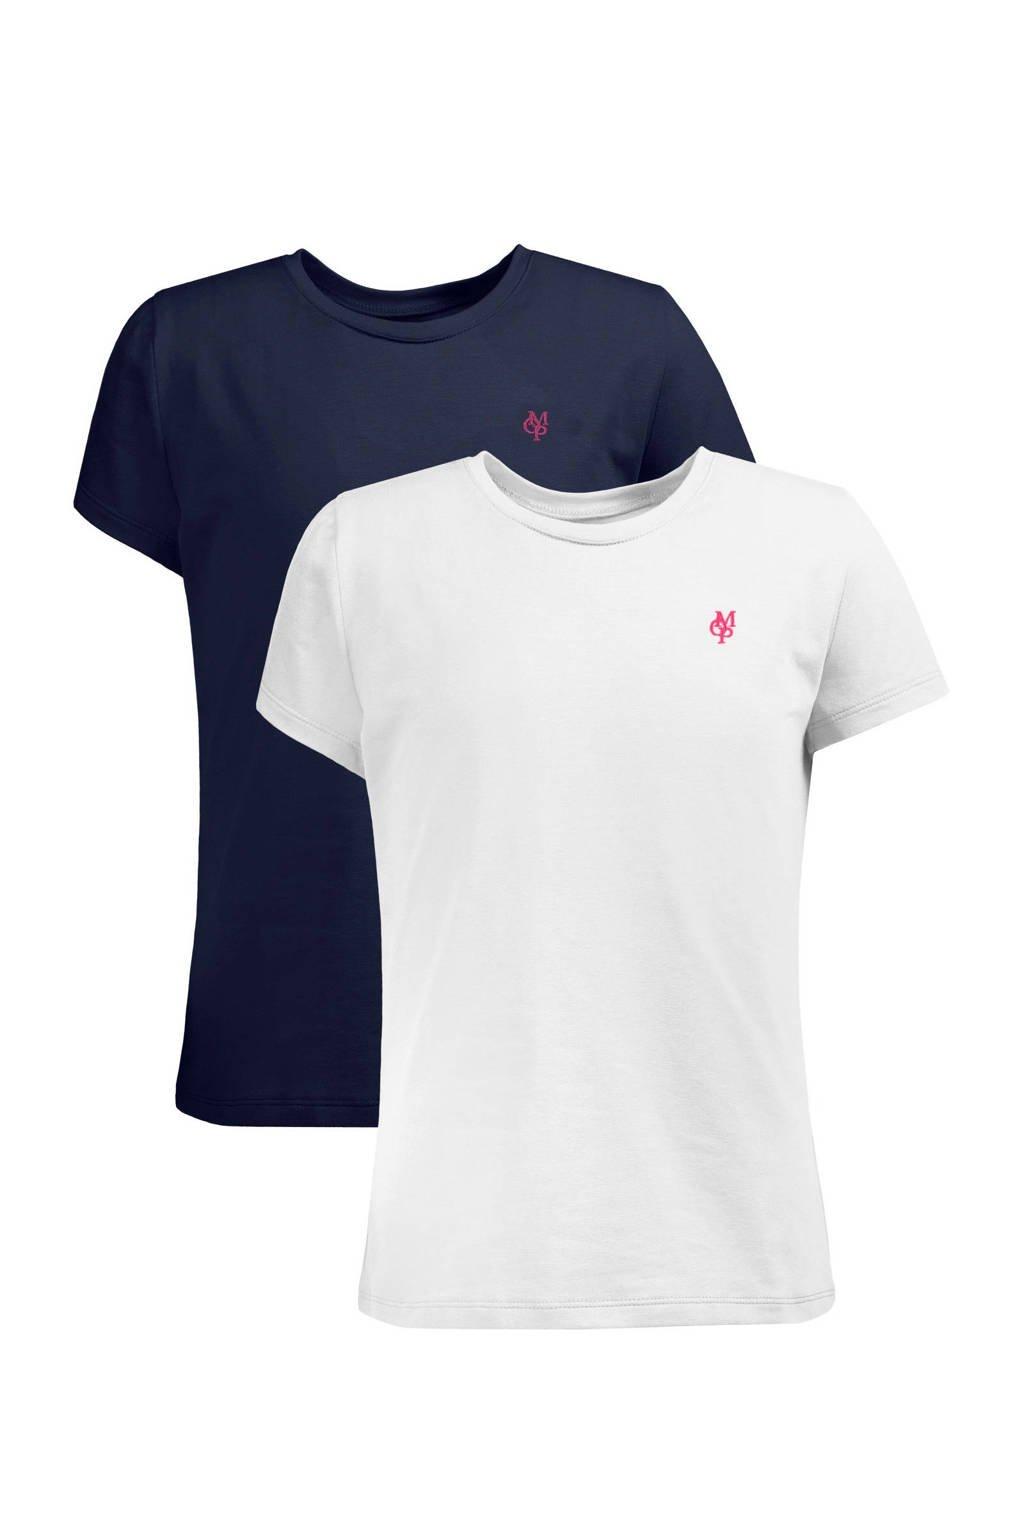 Marc O'Polo T-shirt - set van 2, Donkerblauw/wit